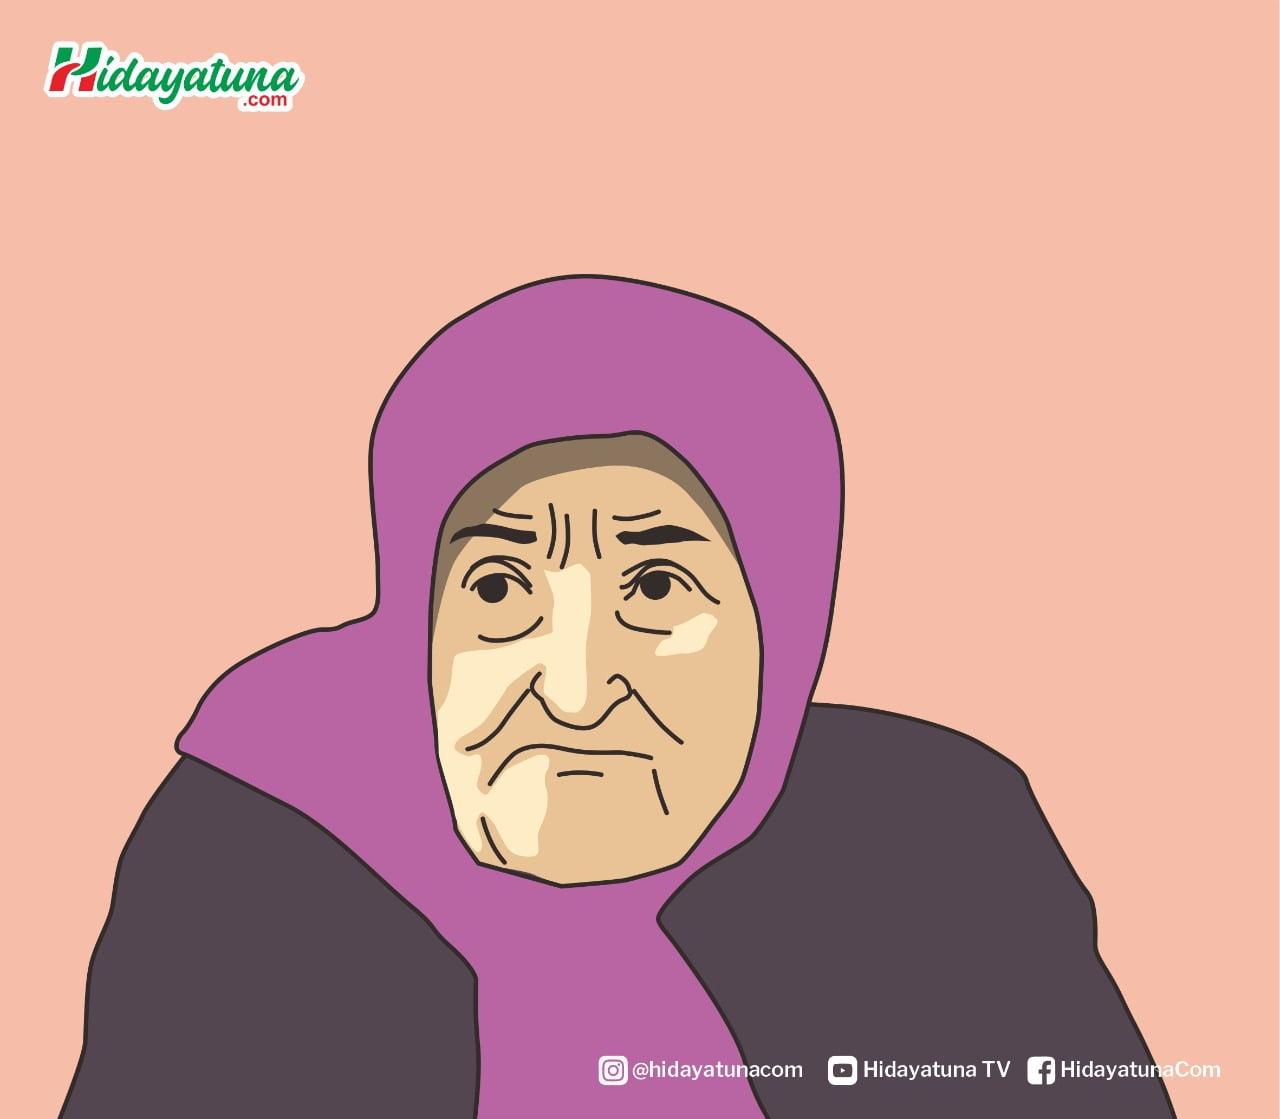 Nenek Obama meninggal(Ilustrasi/Hidayatuna)